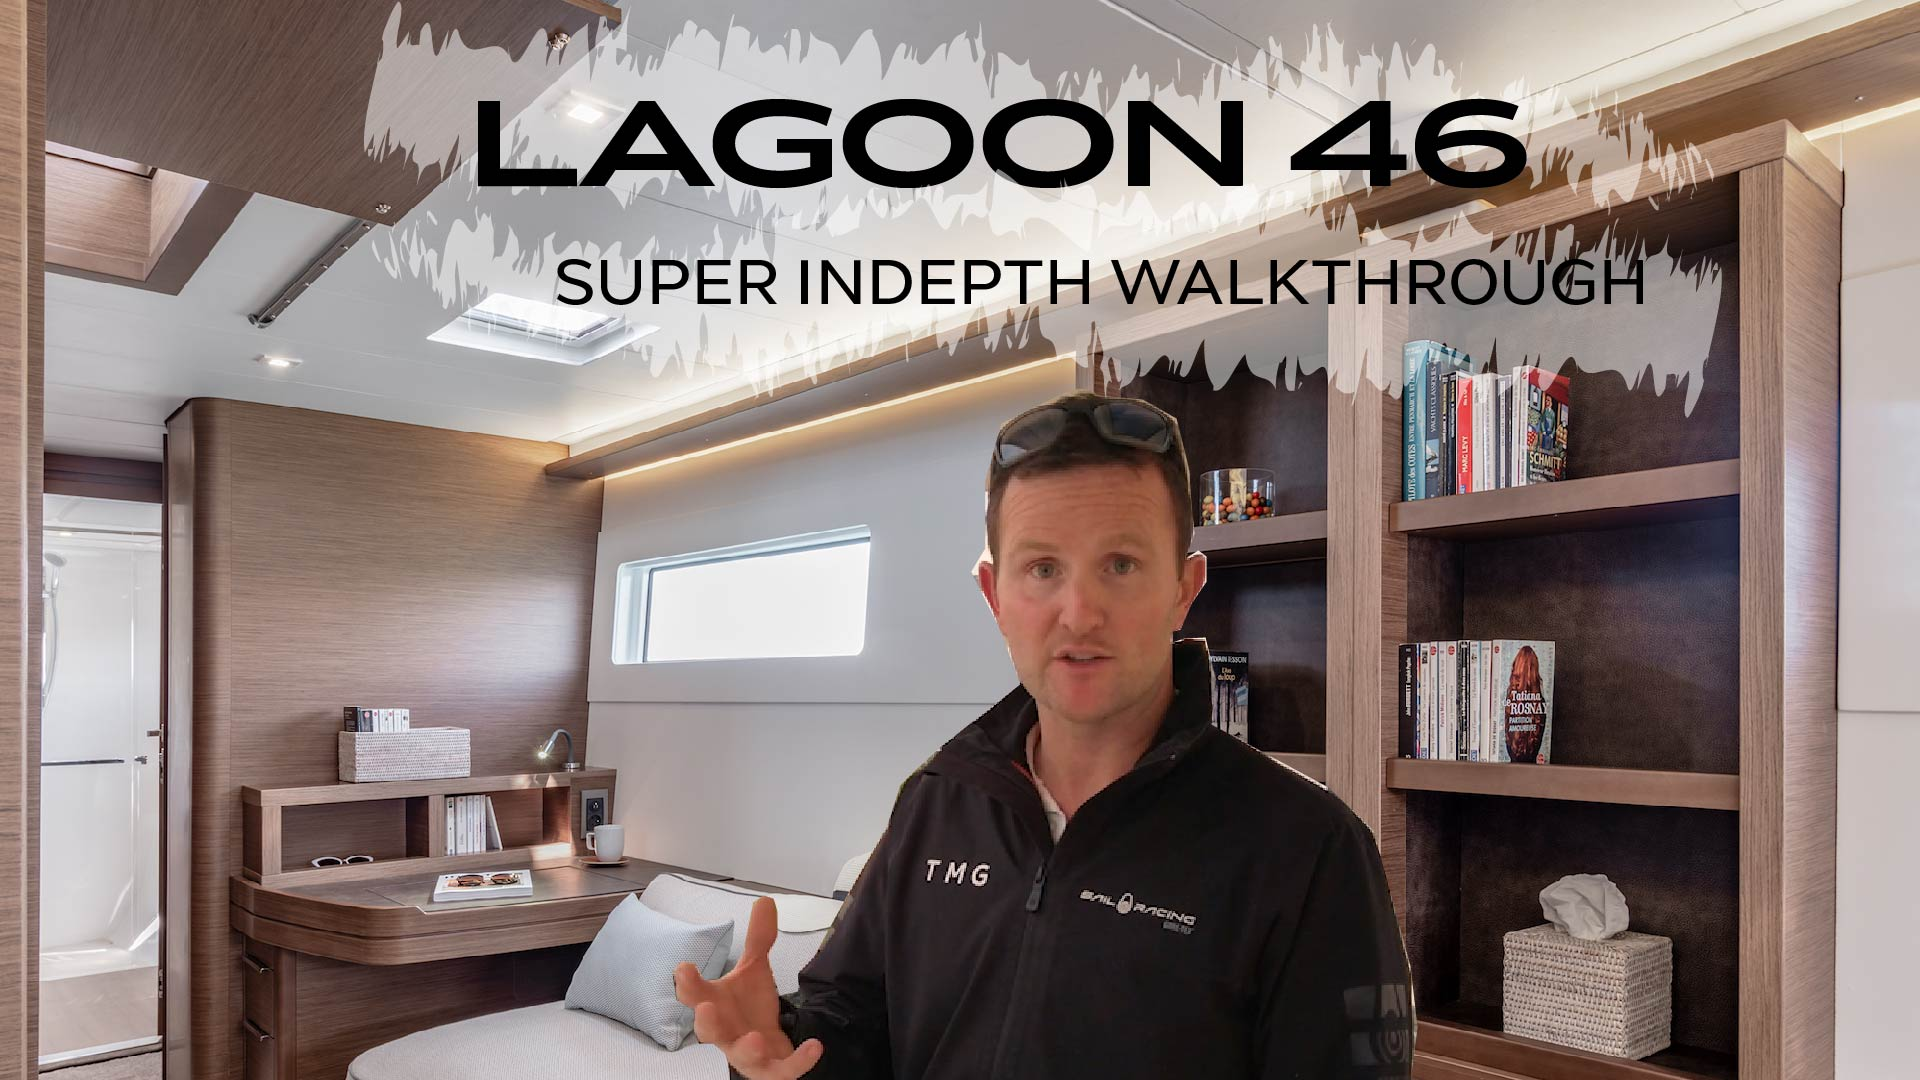 LAGOON 46 WEBINAR WALKTHROUGH